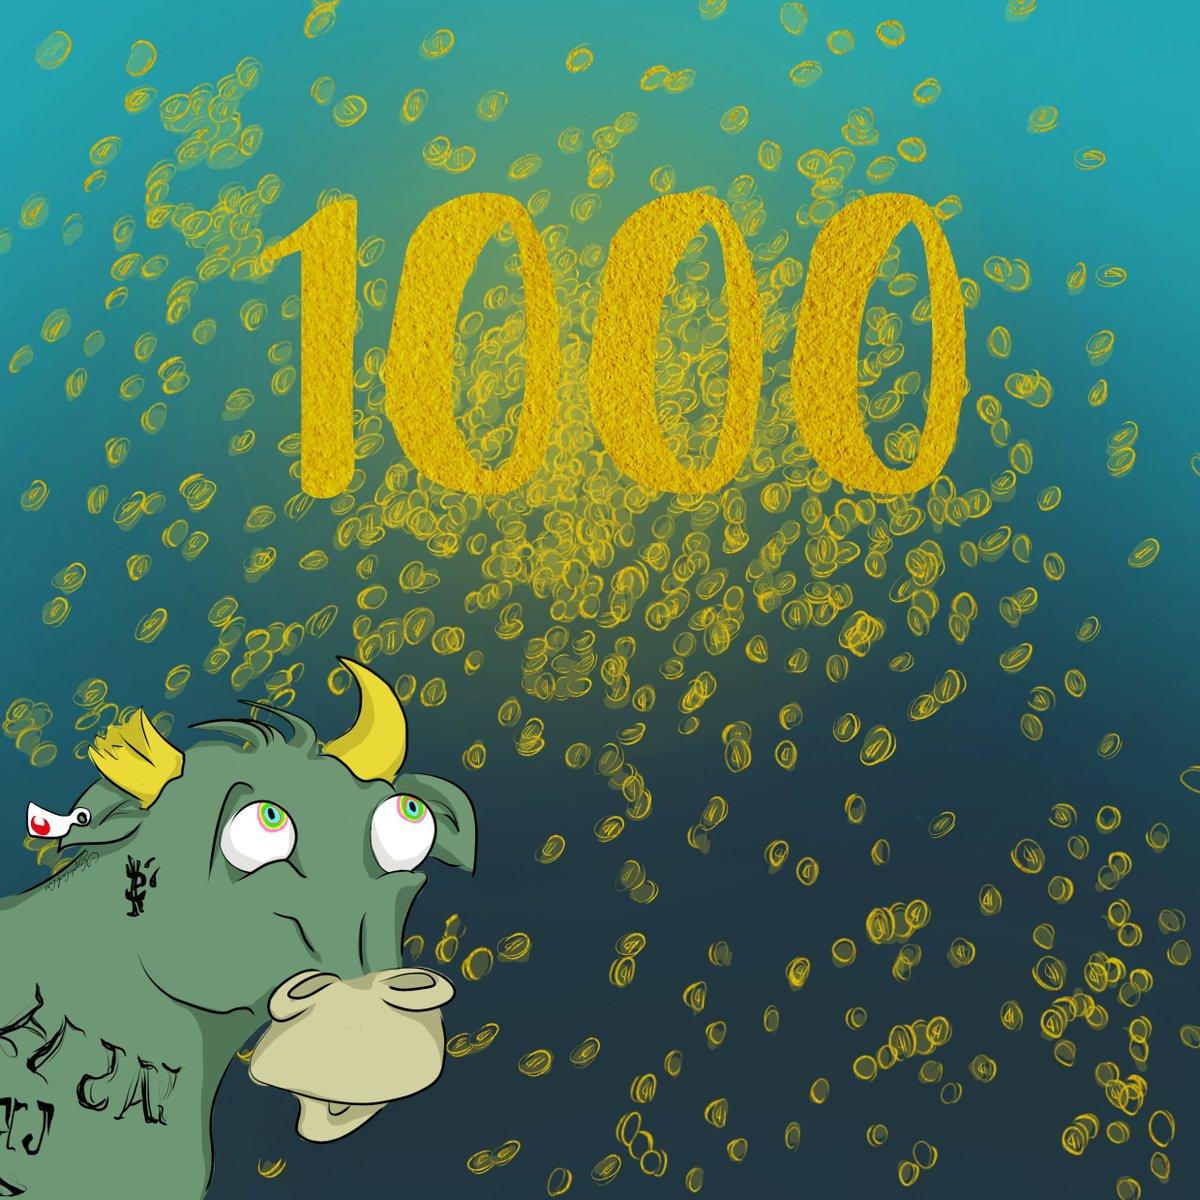 CryptoCashCow 1000 Followers on Twitter